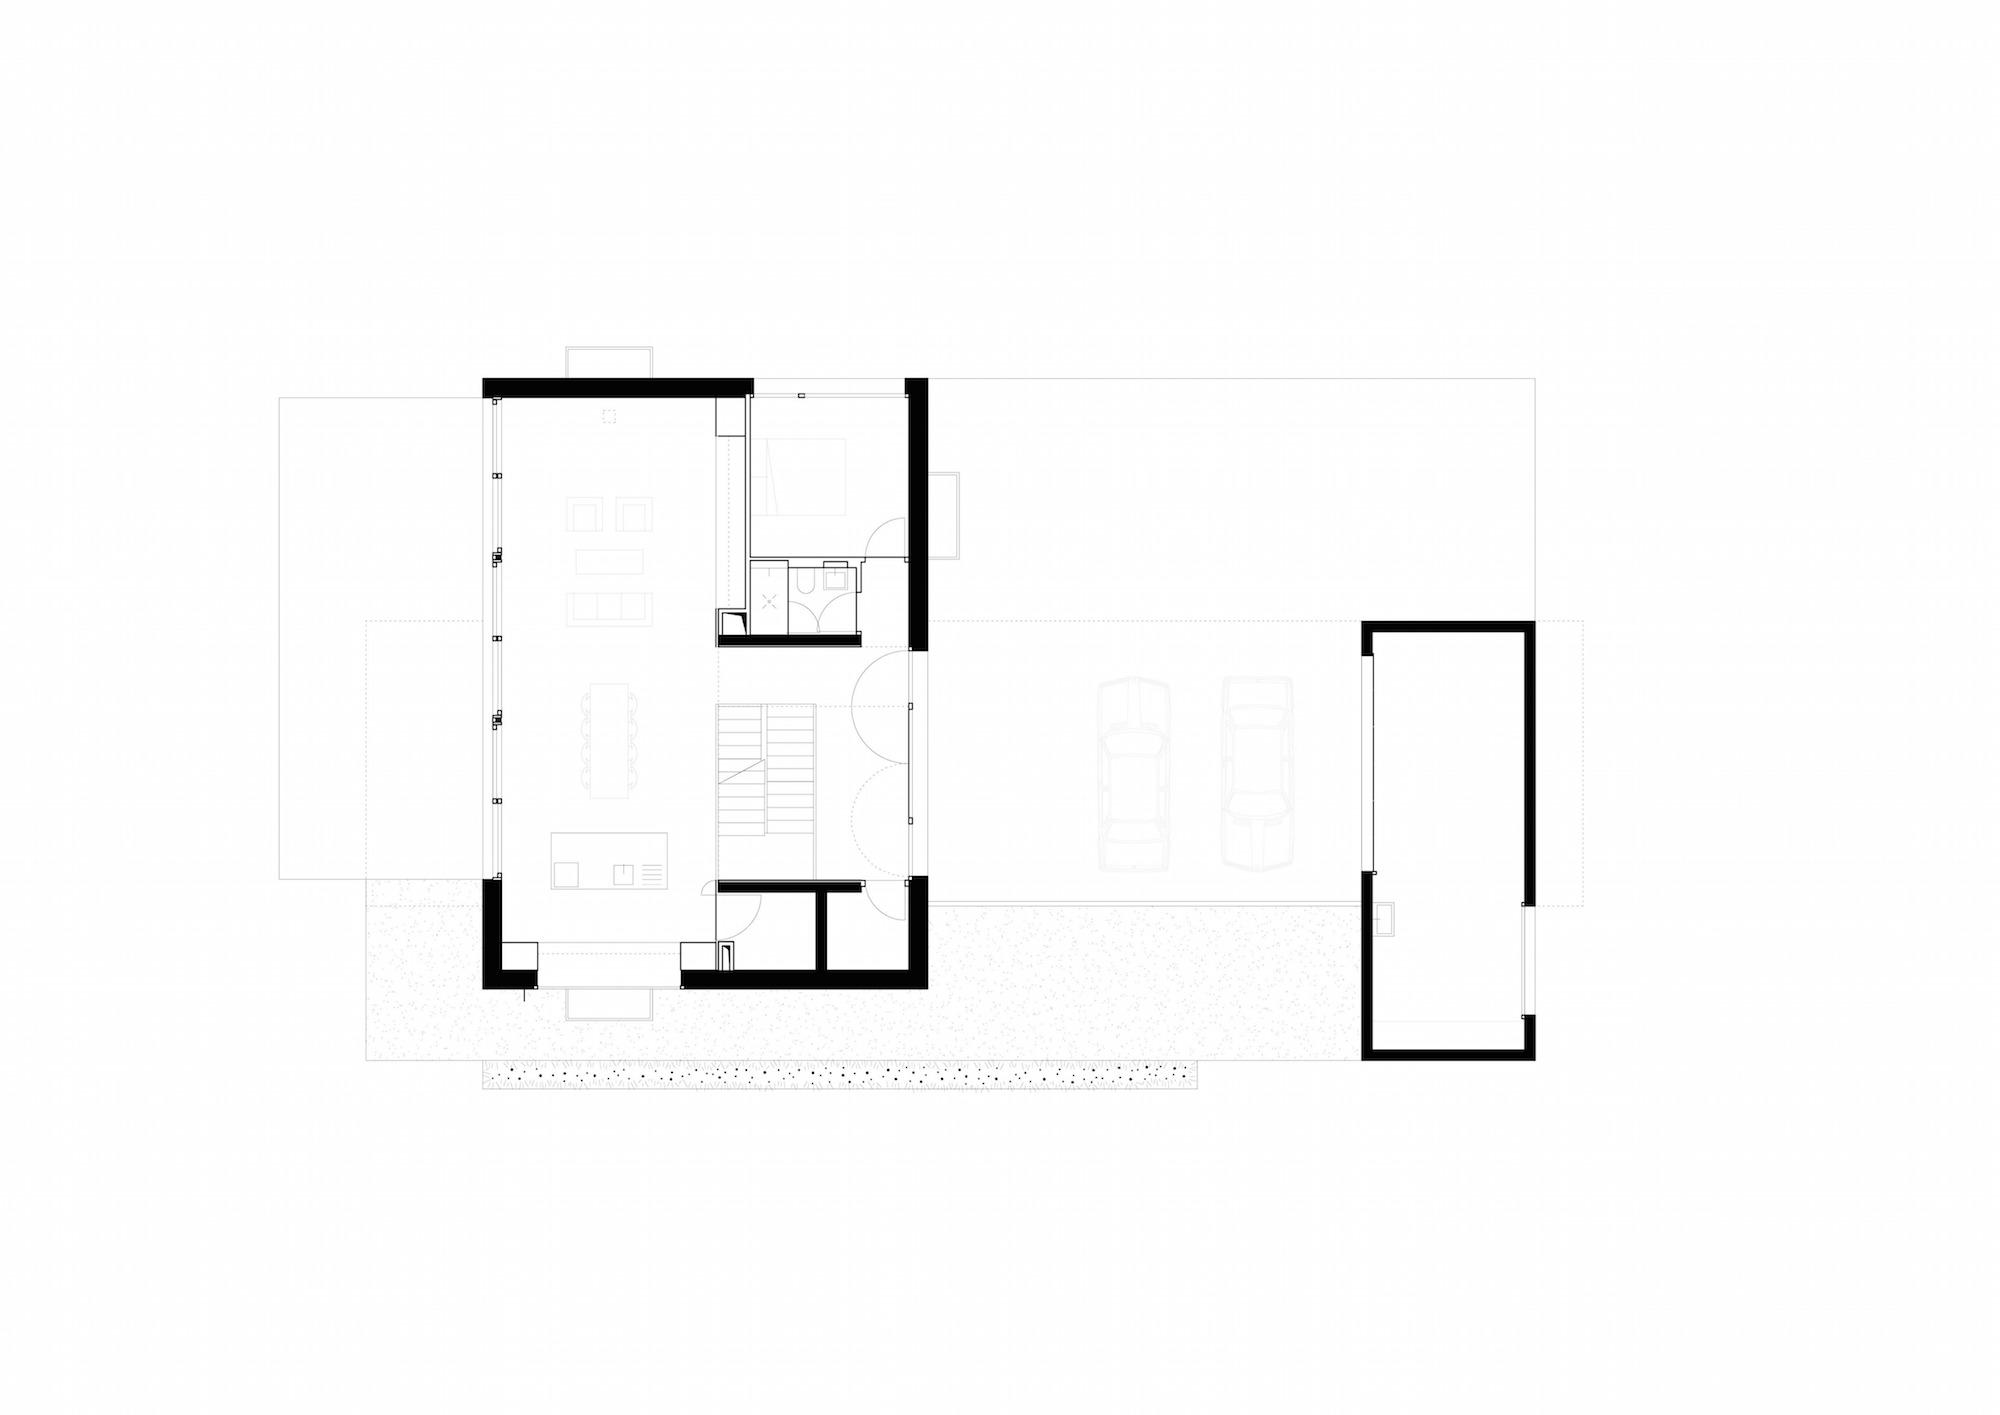 Minergie Villa Christian von Düring architecte-27